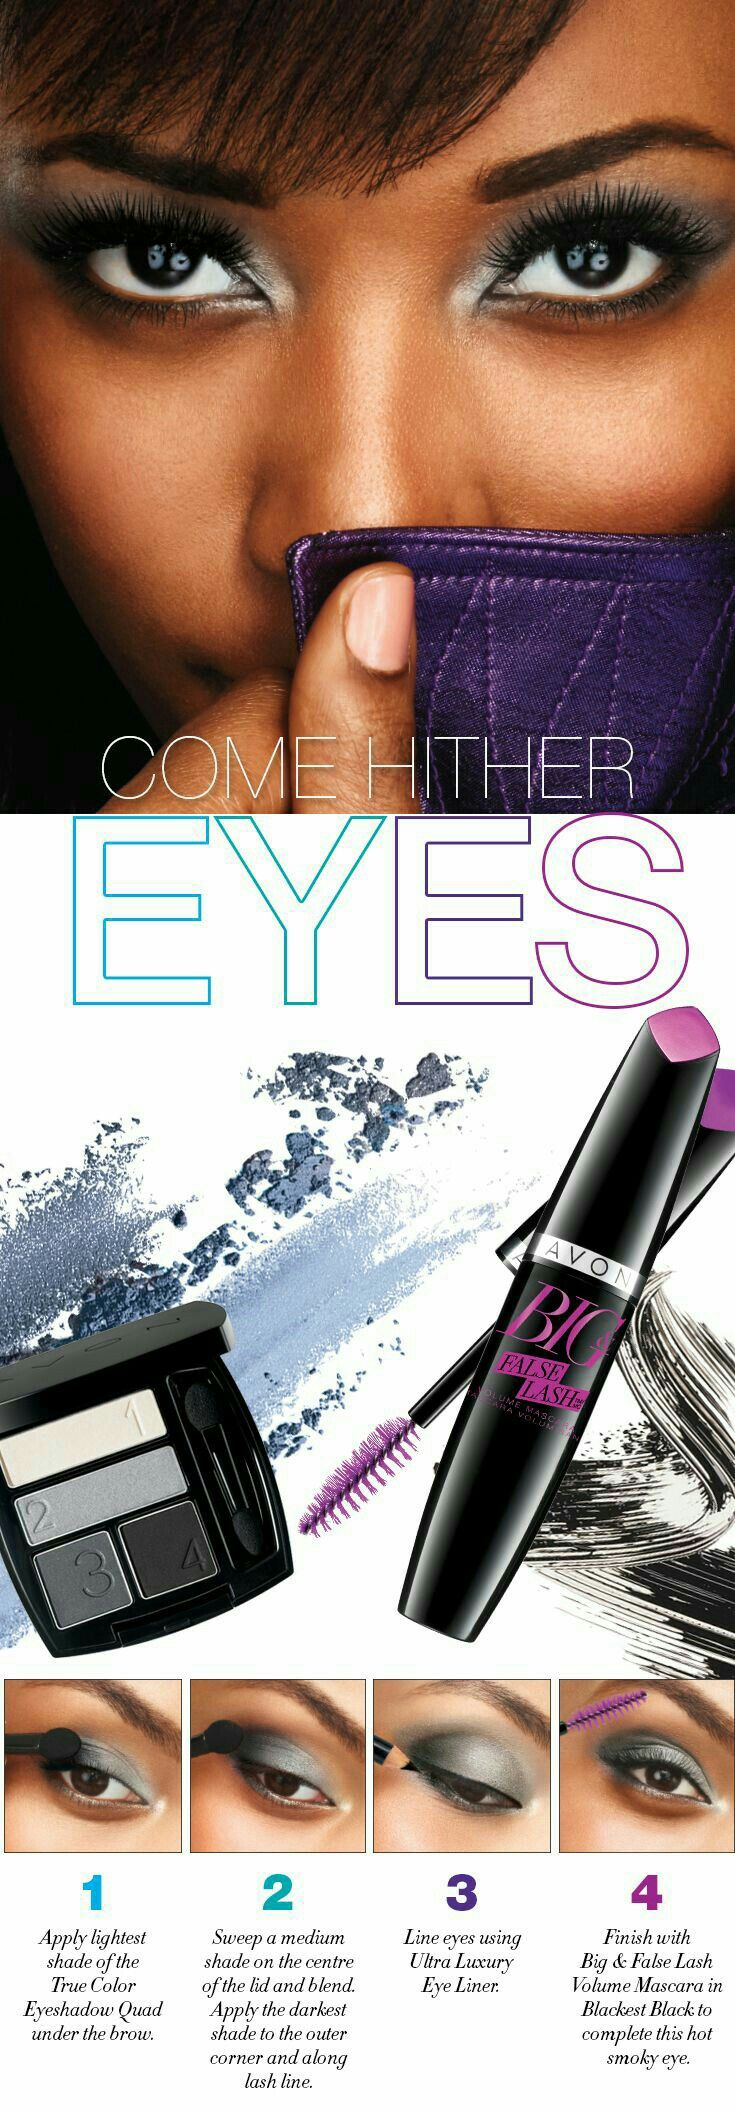 Eye makeup tutorial. Avon eyeshadow, Avon makeup, Avon